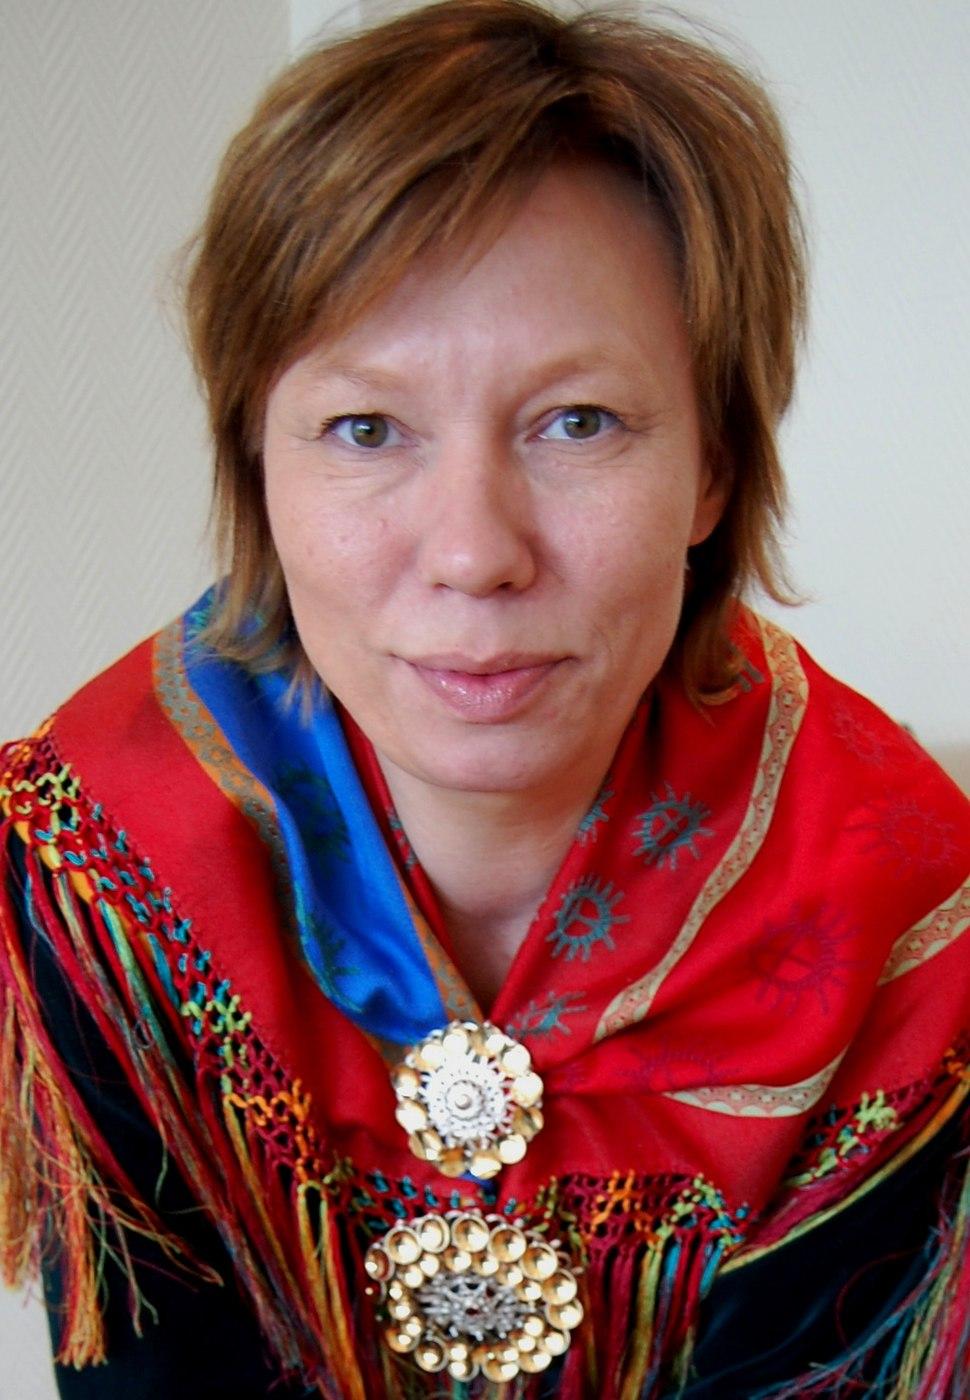 Ann Mari Thomassen juni09